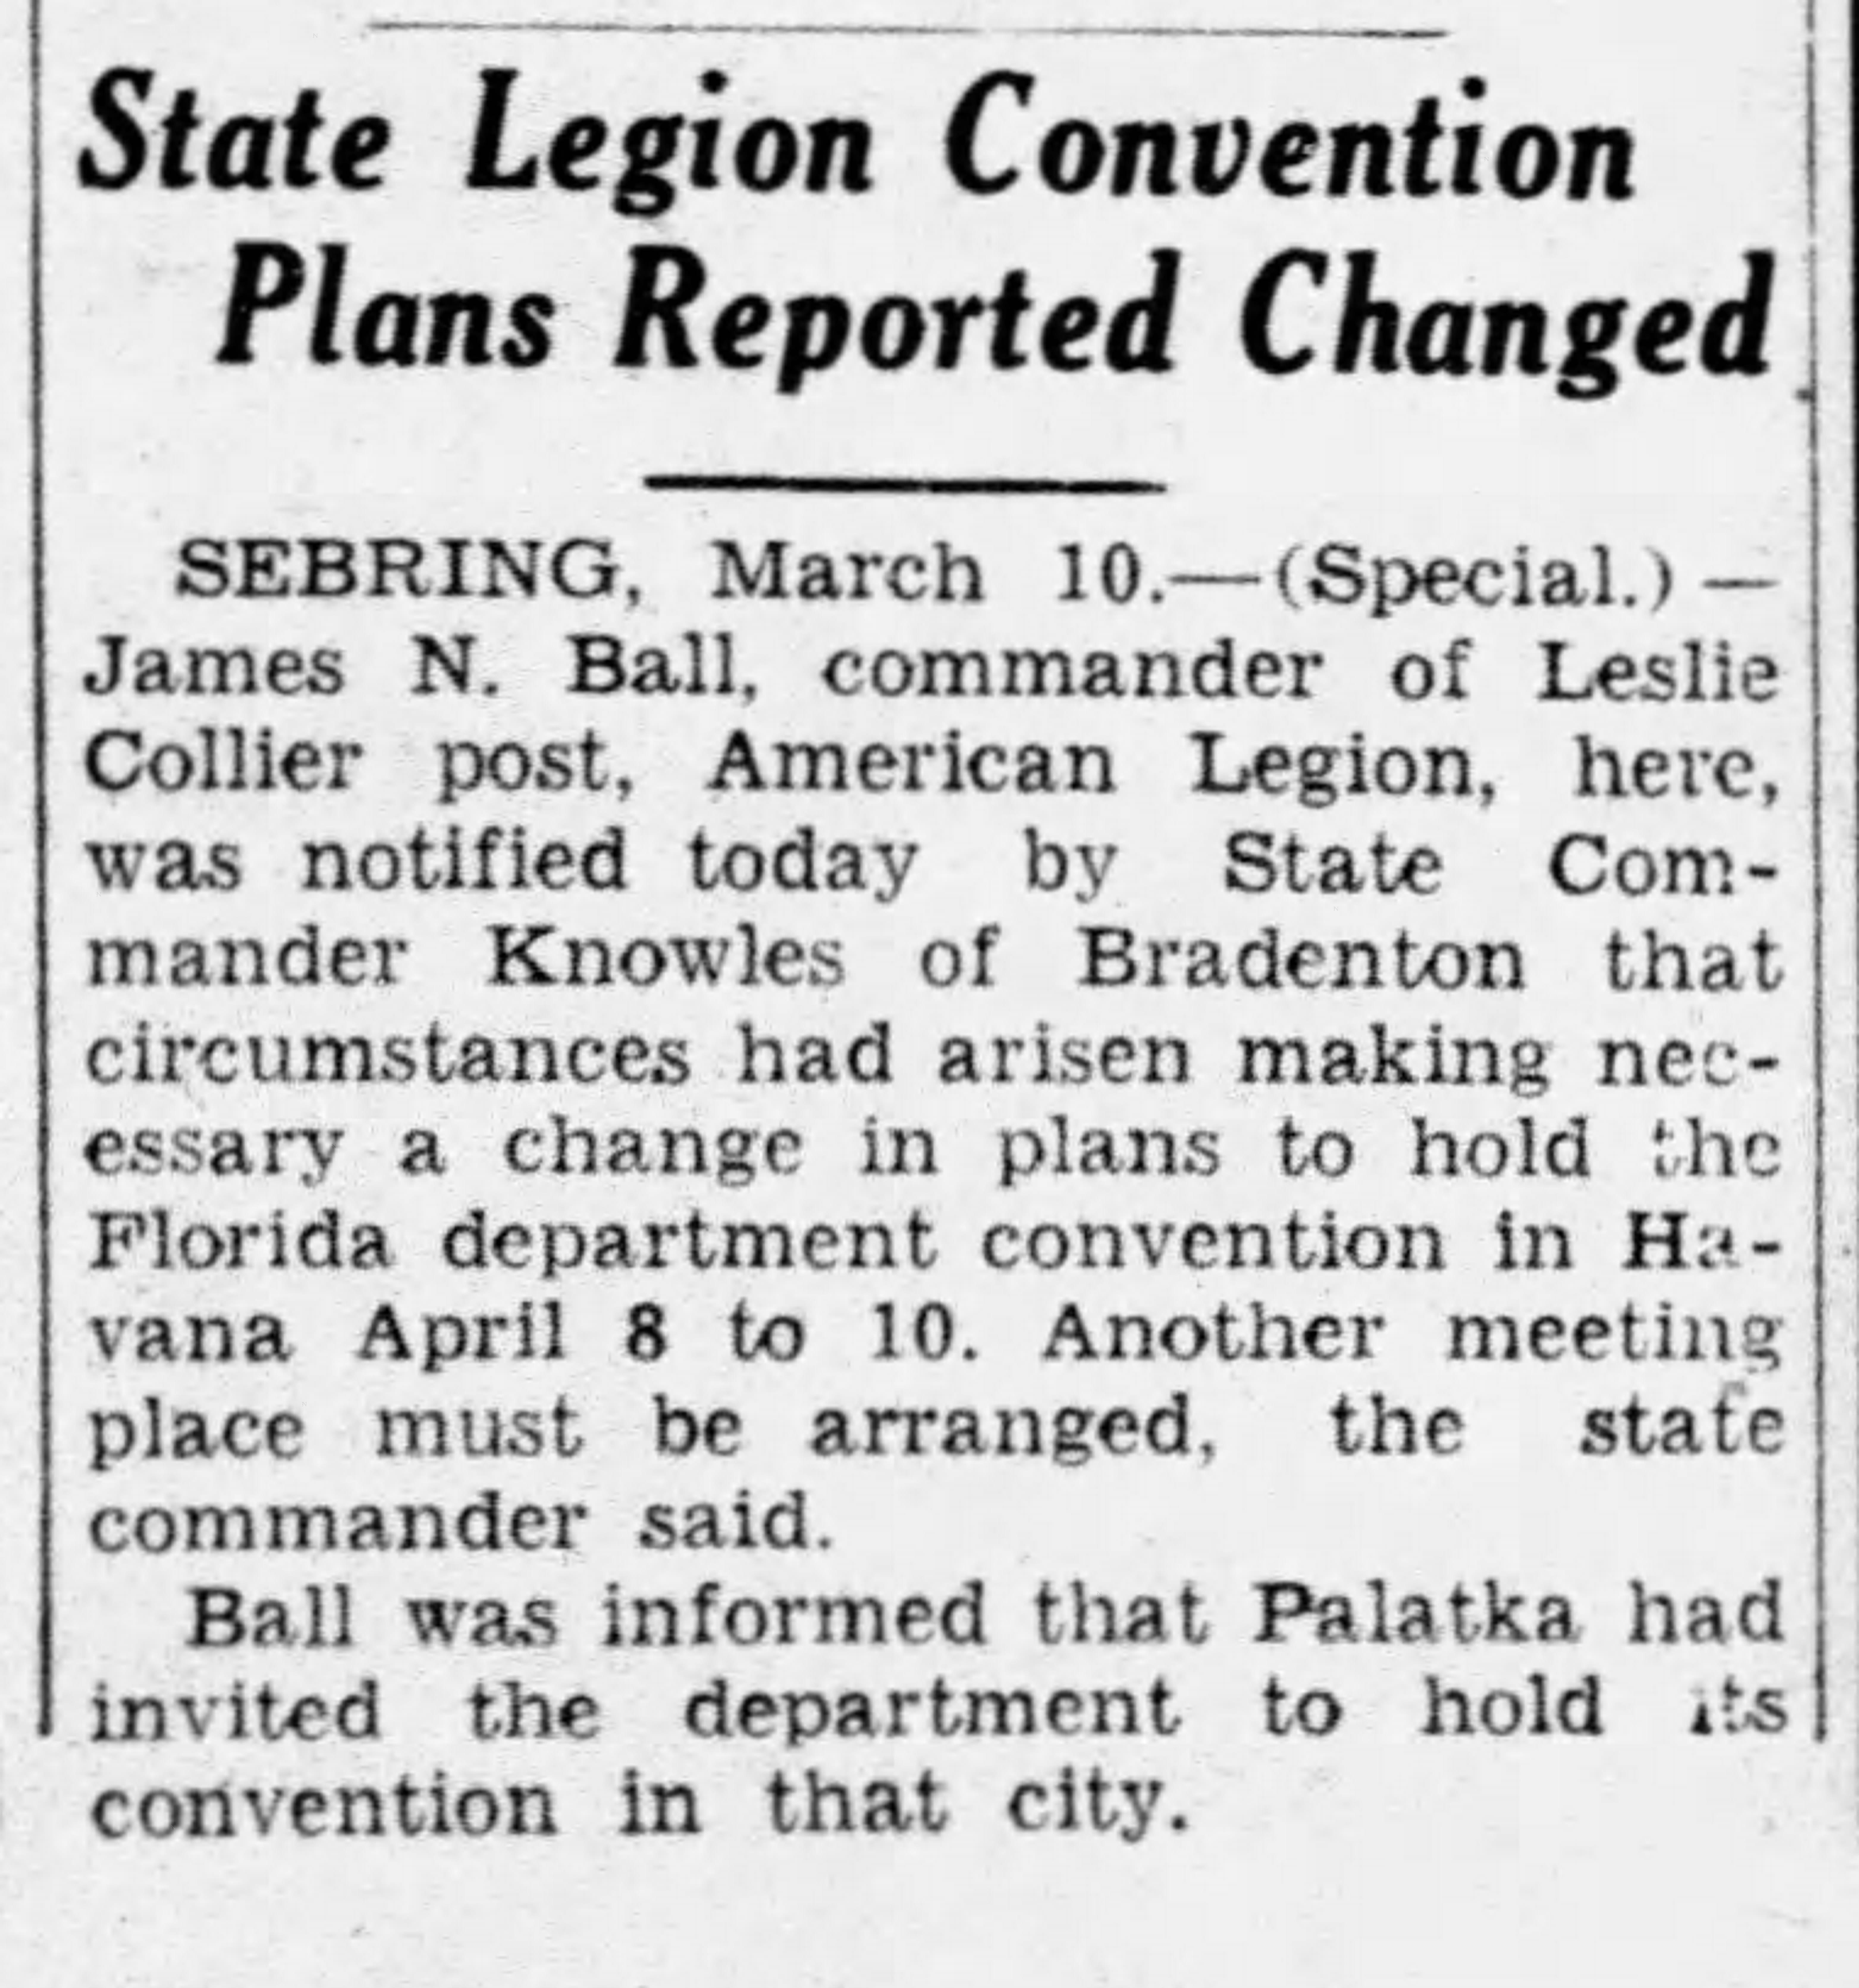 Figure 2: Tampa Tribune, March 11, 1933